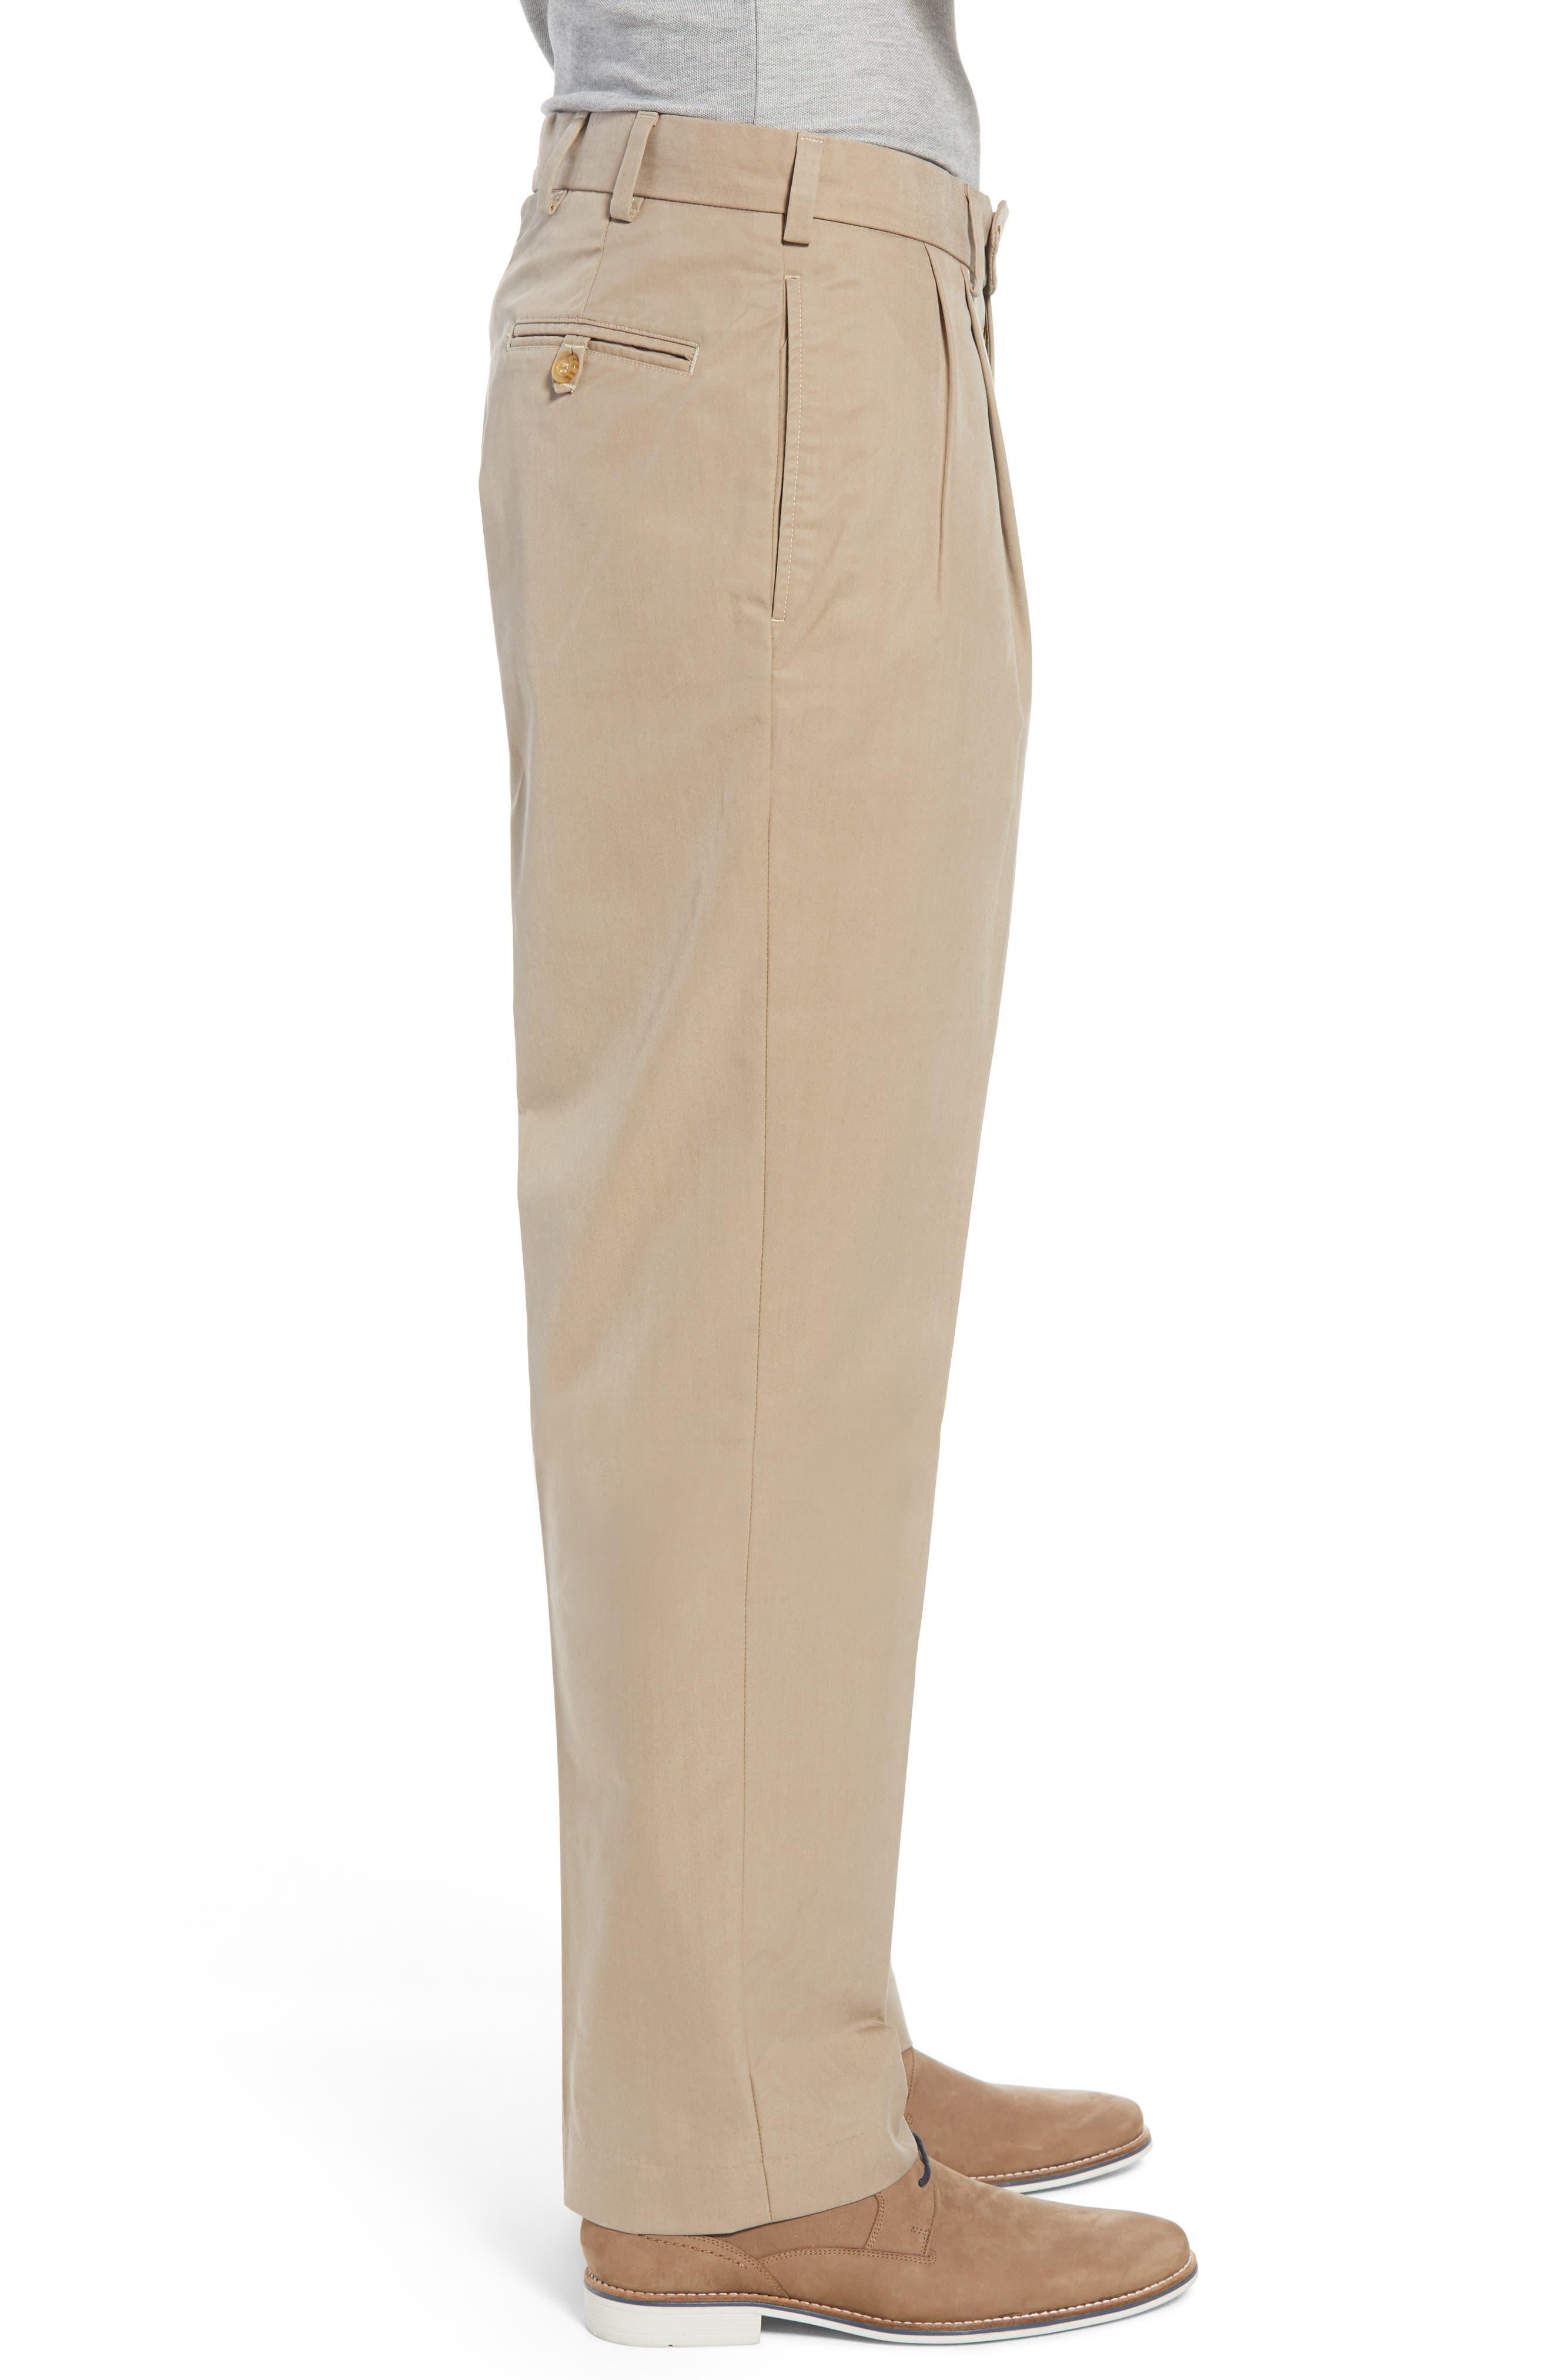 M2 Classic Fit Pleated Travel Twill Pants,                             Alternate thumbnail 3, color,                             Khaki